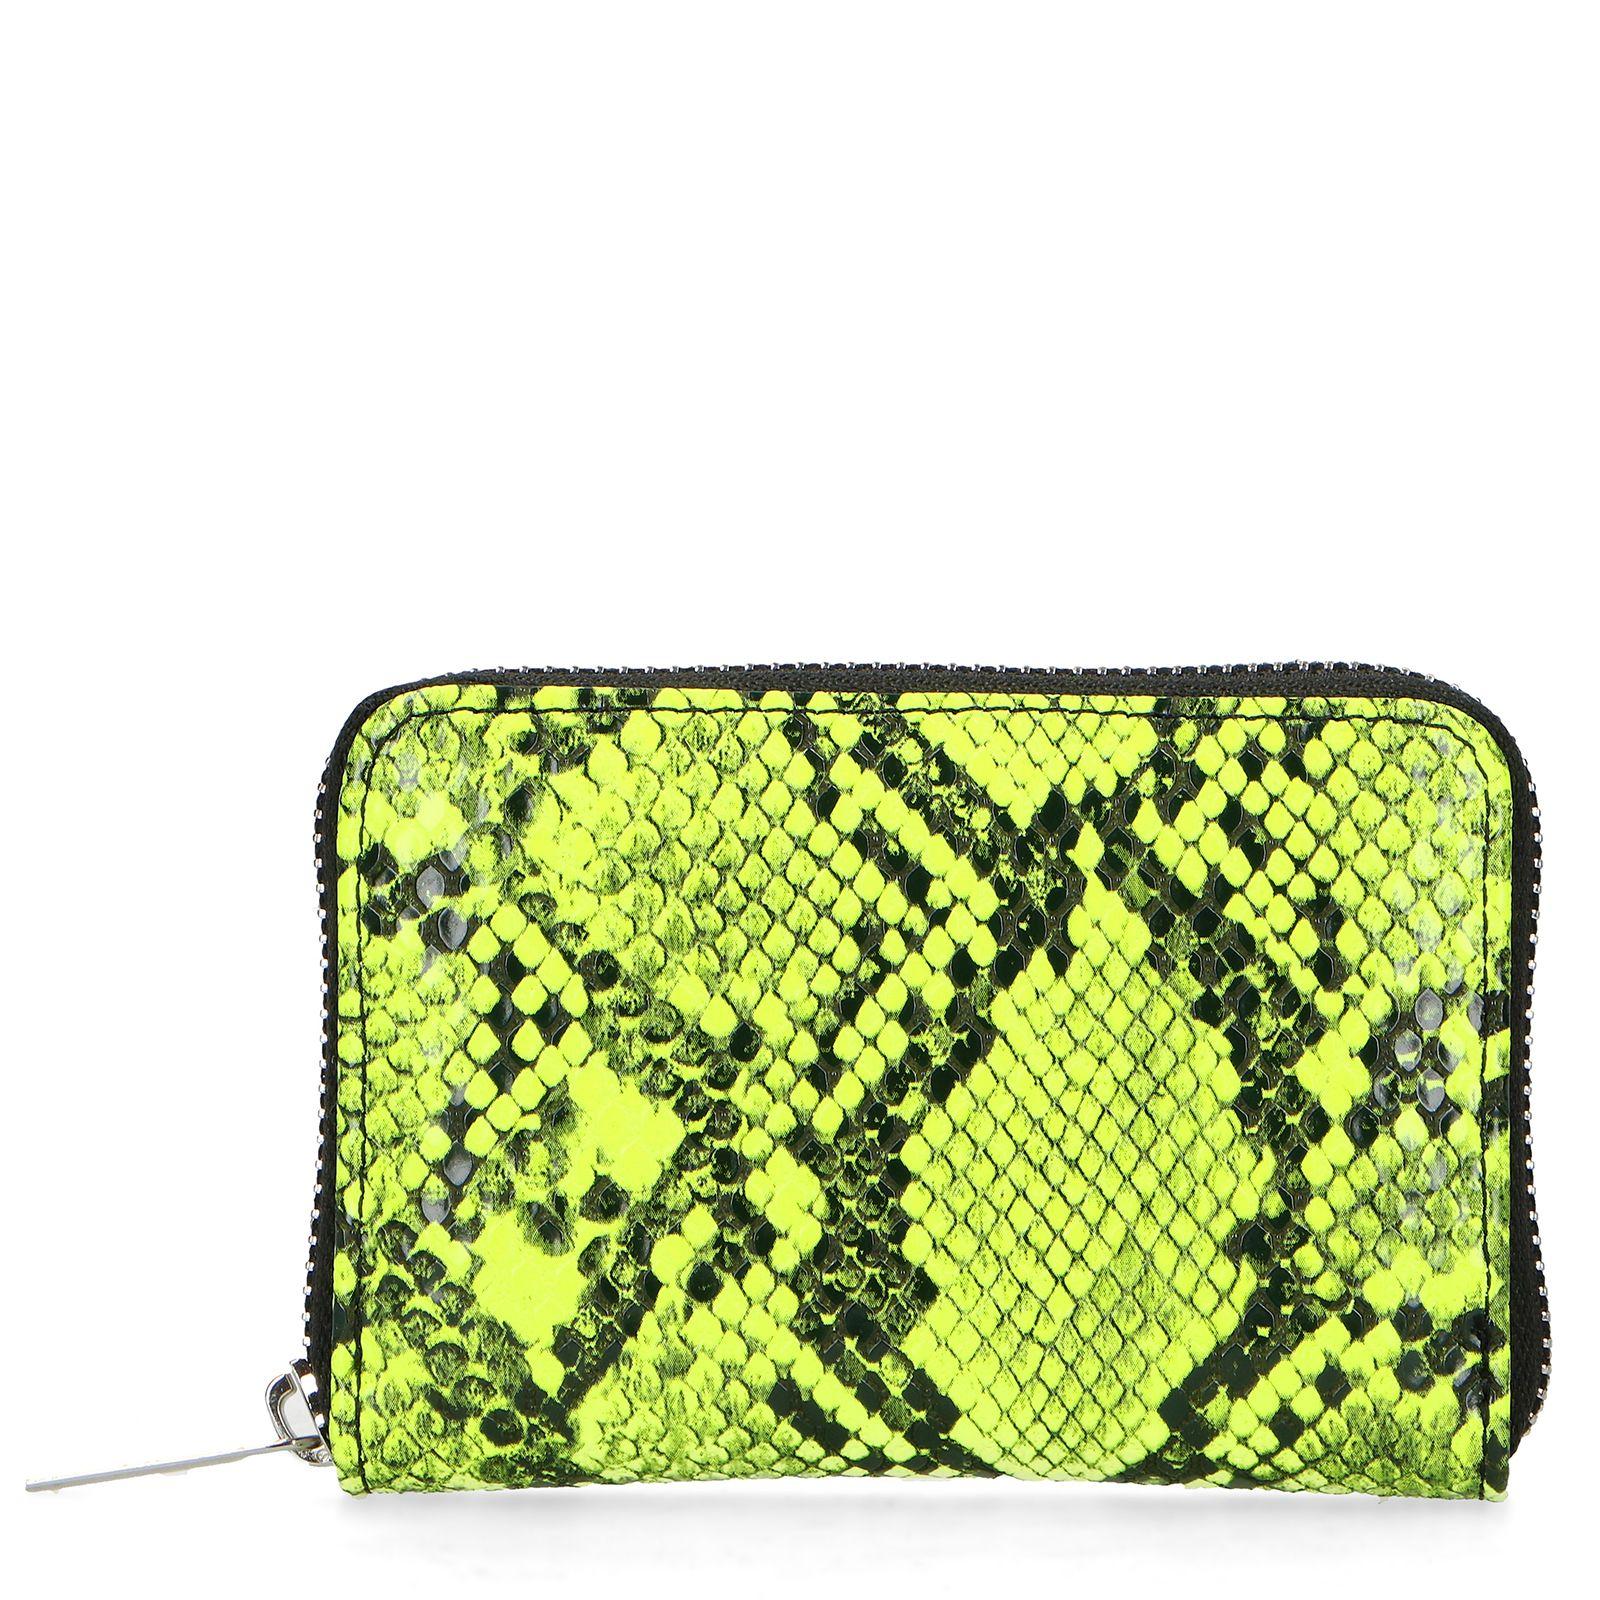 Sacha Neon gele portemonnee met snakeskin